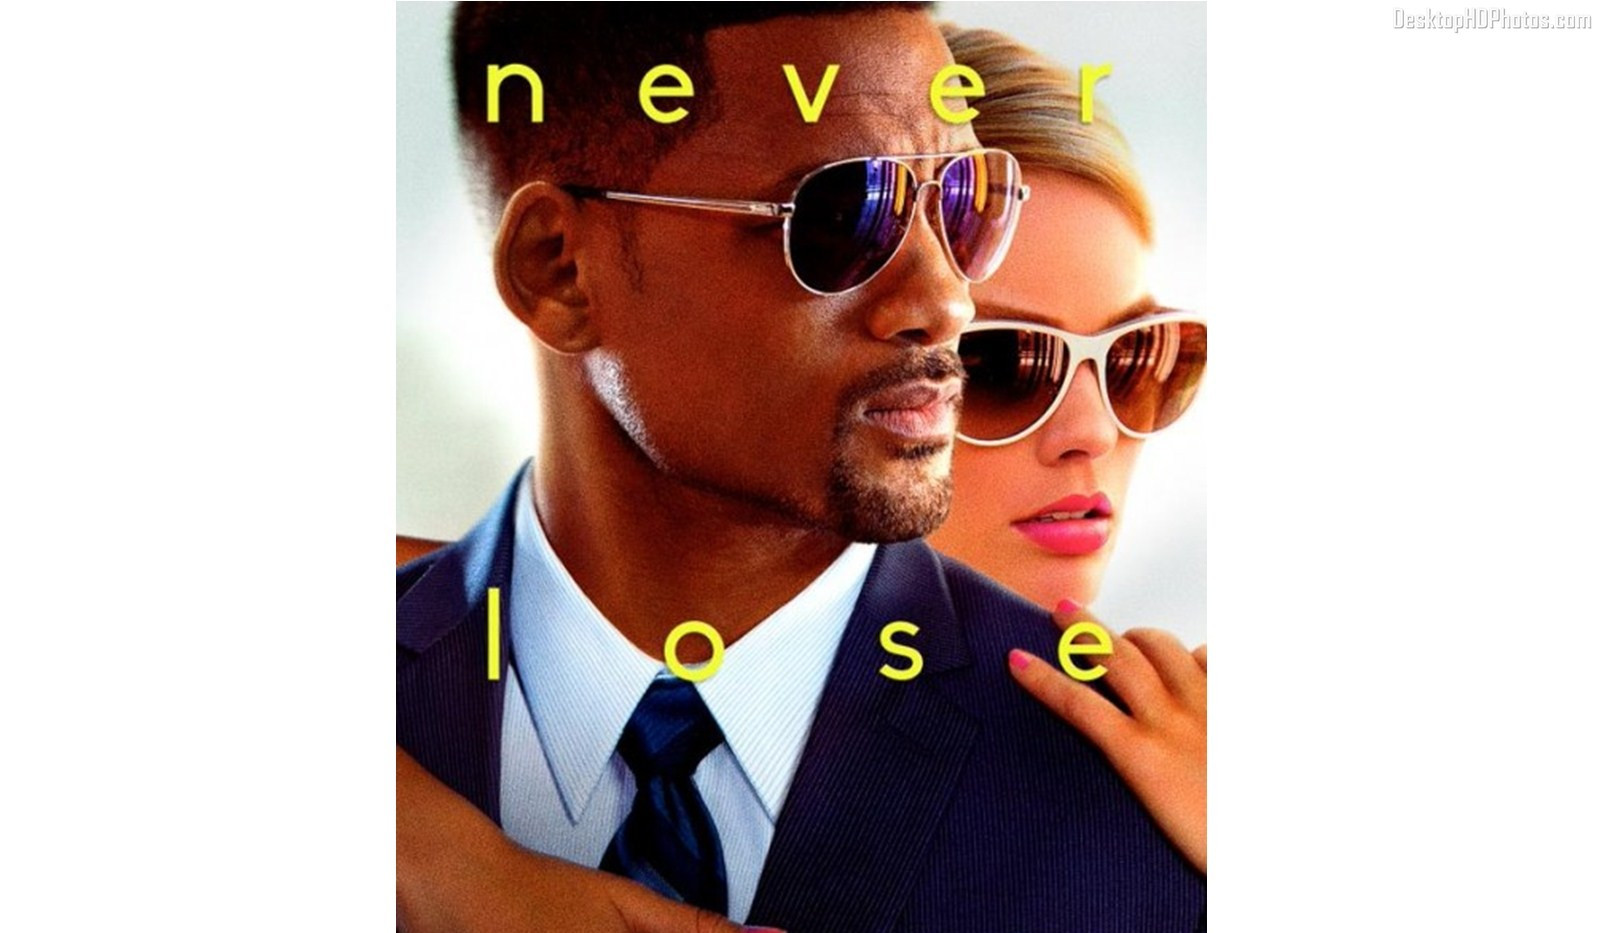 focus-2015-movie-poster.jpg